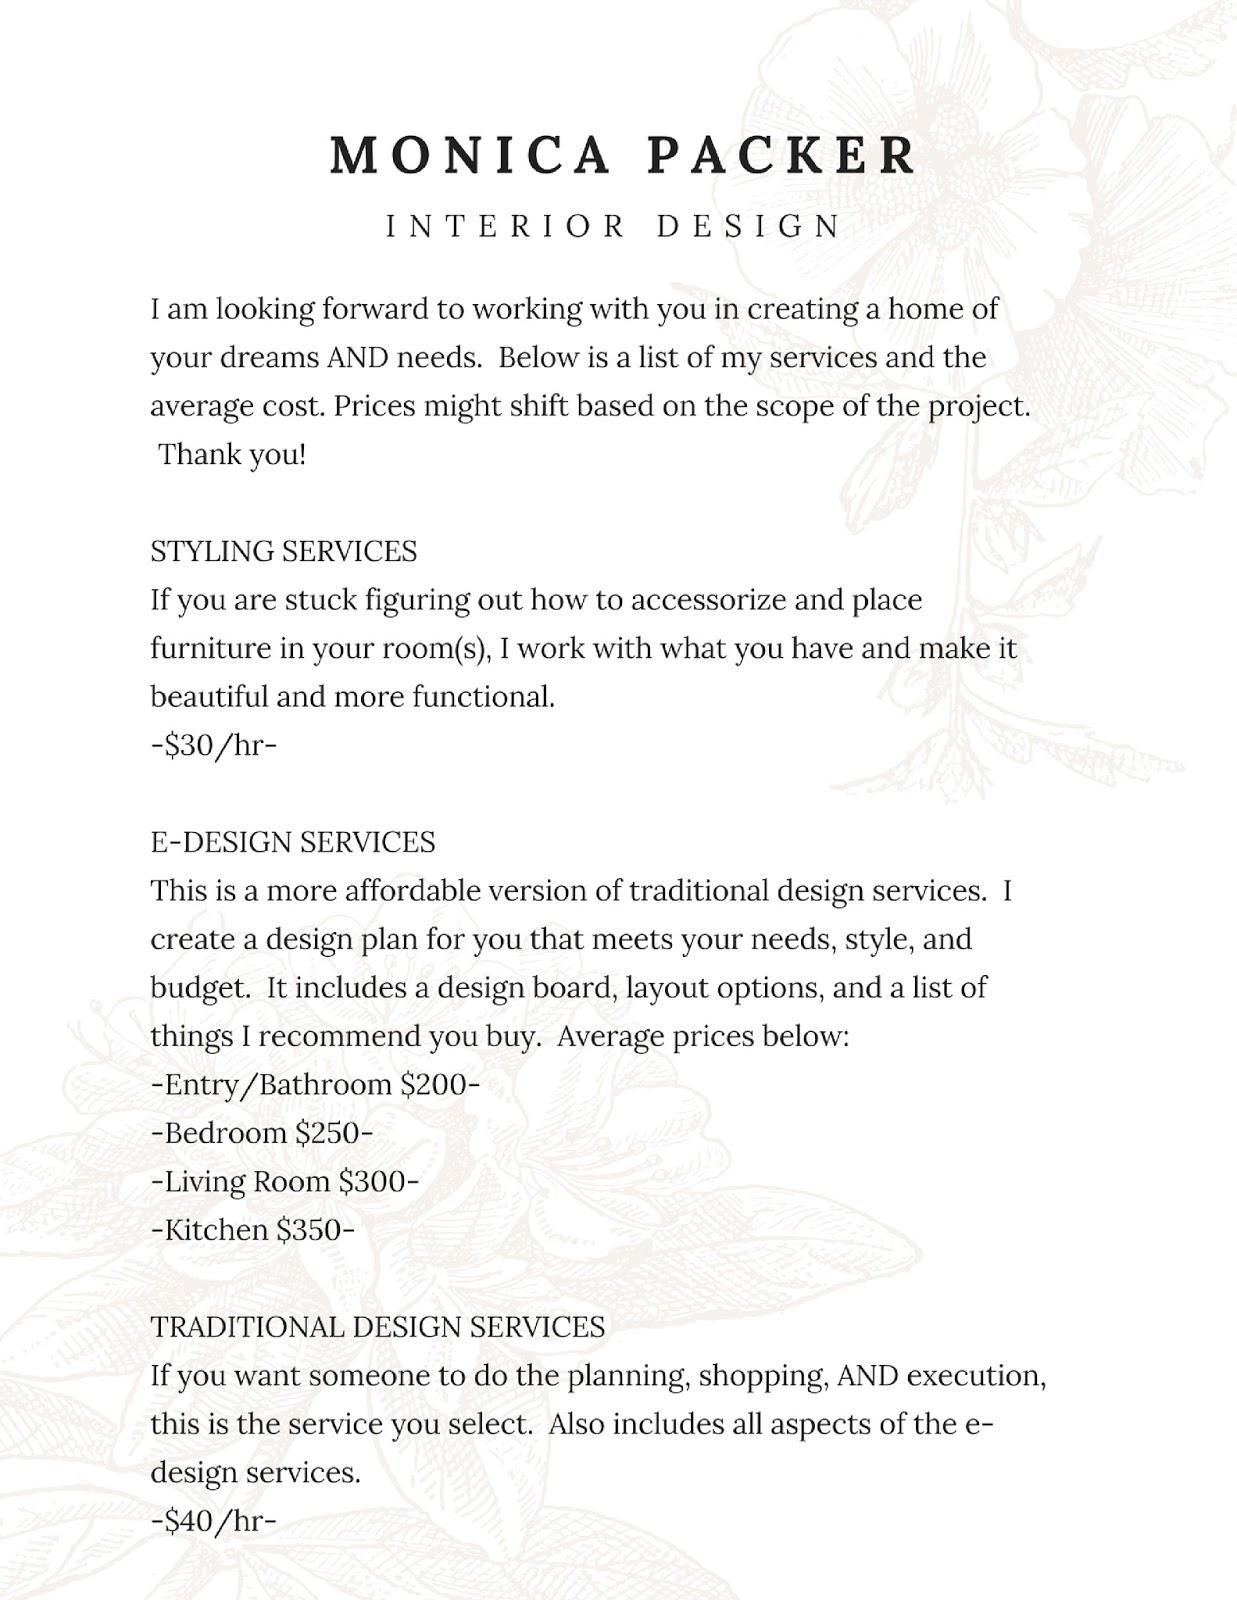 Cost of interior design services for Interior design services pricing